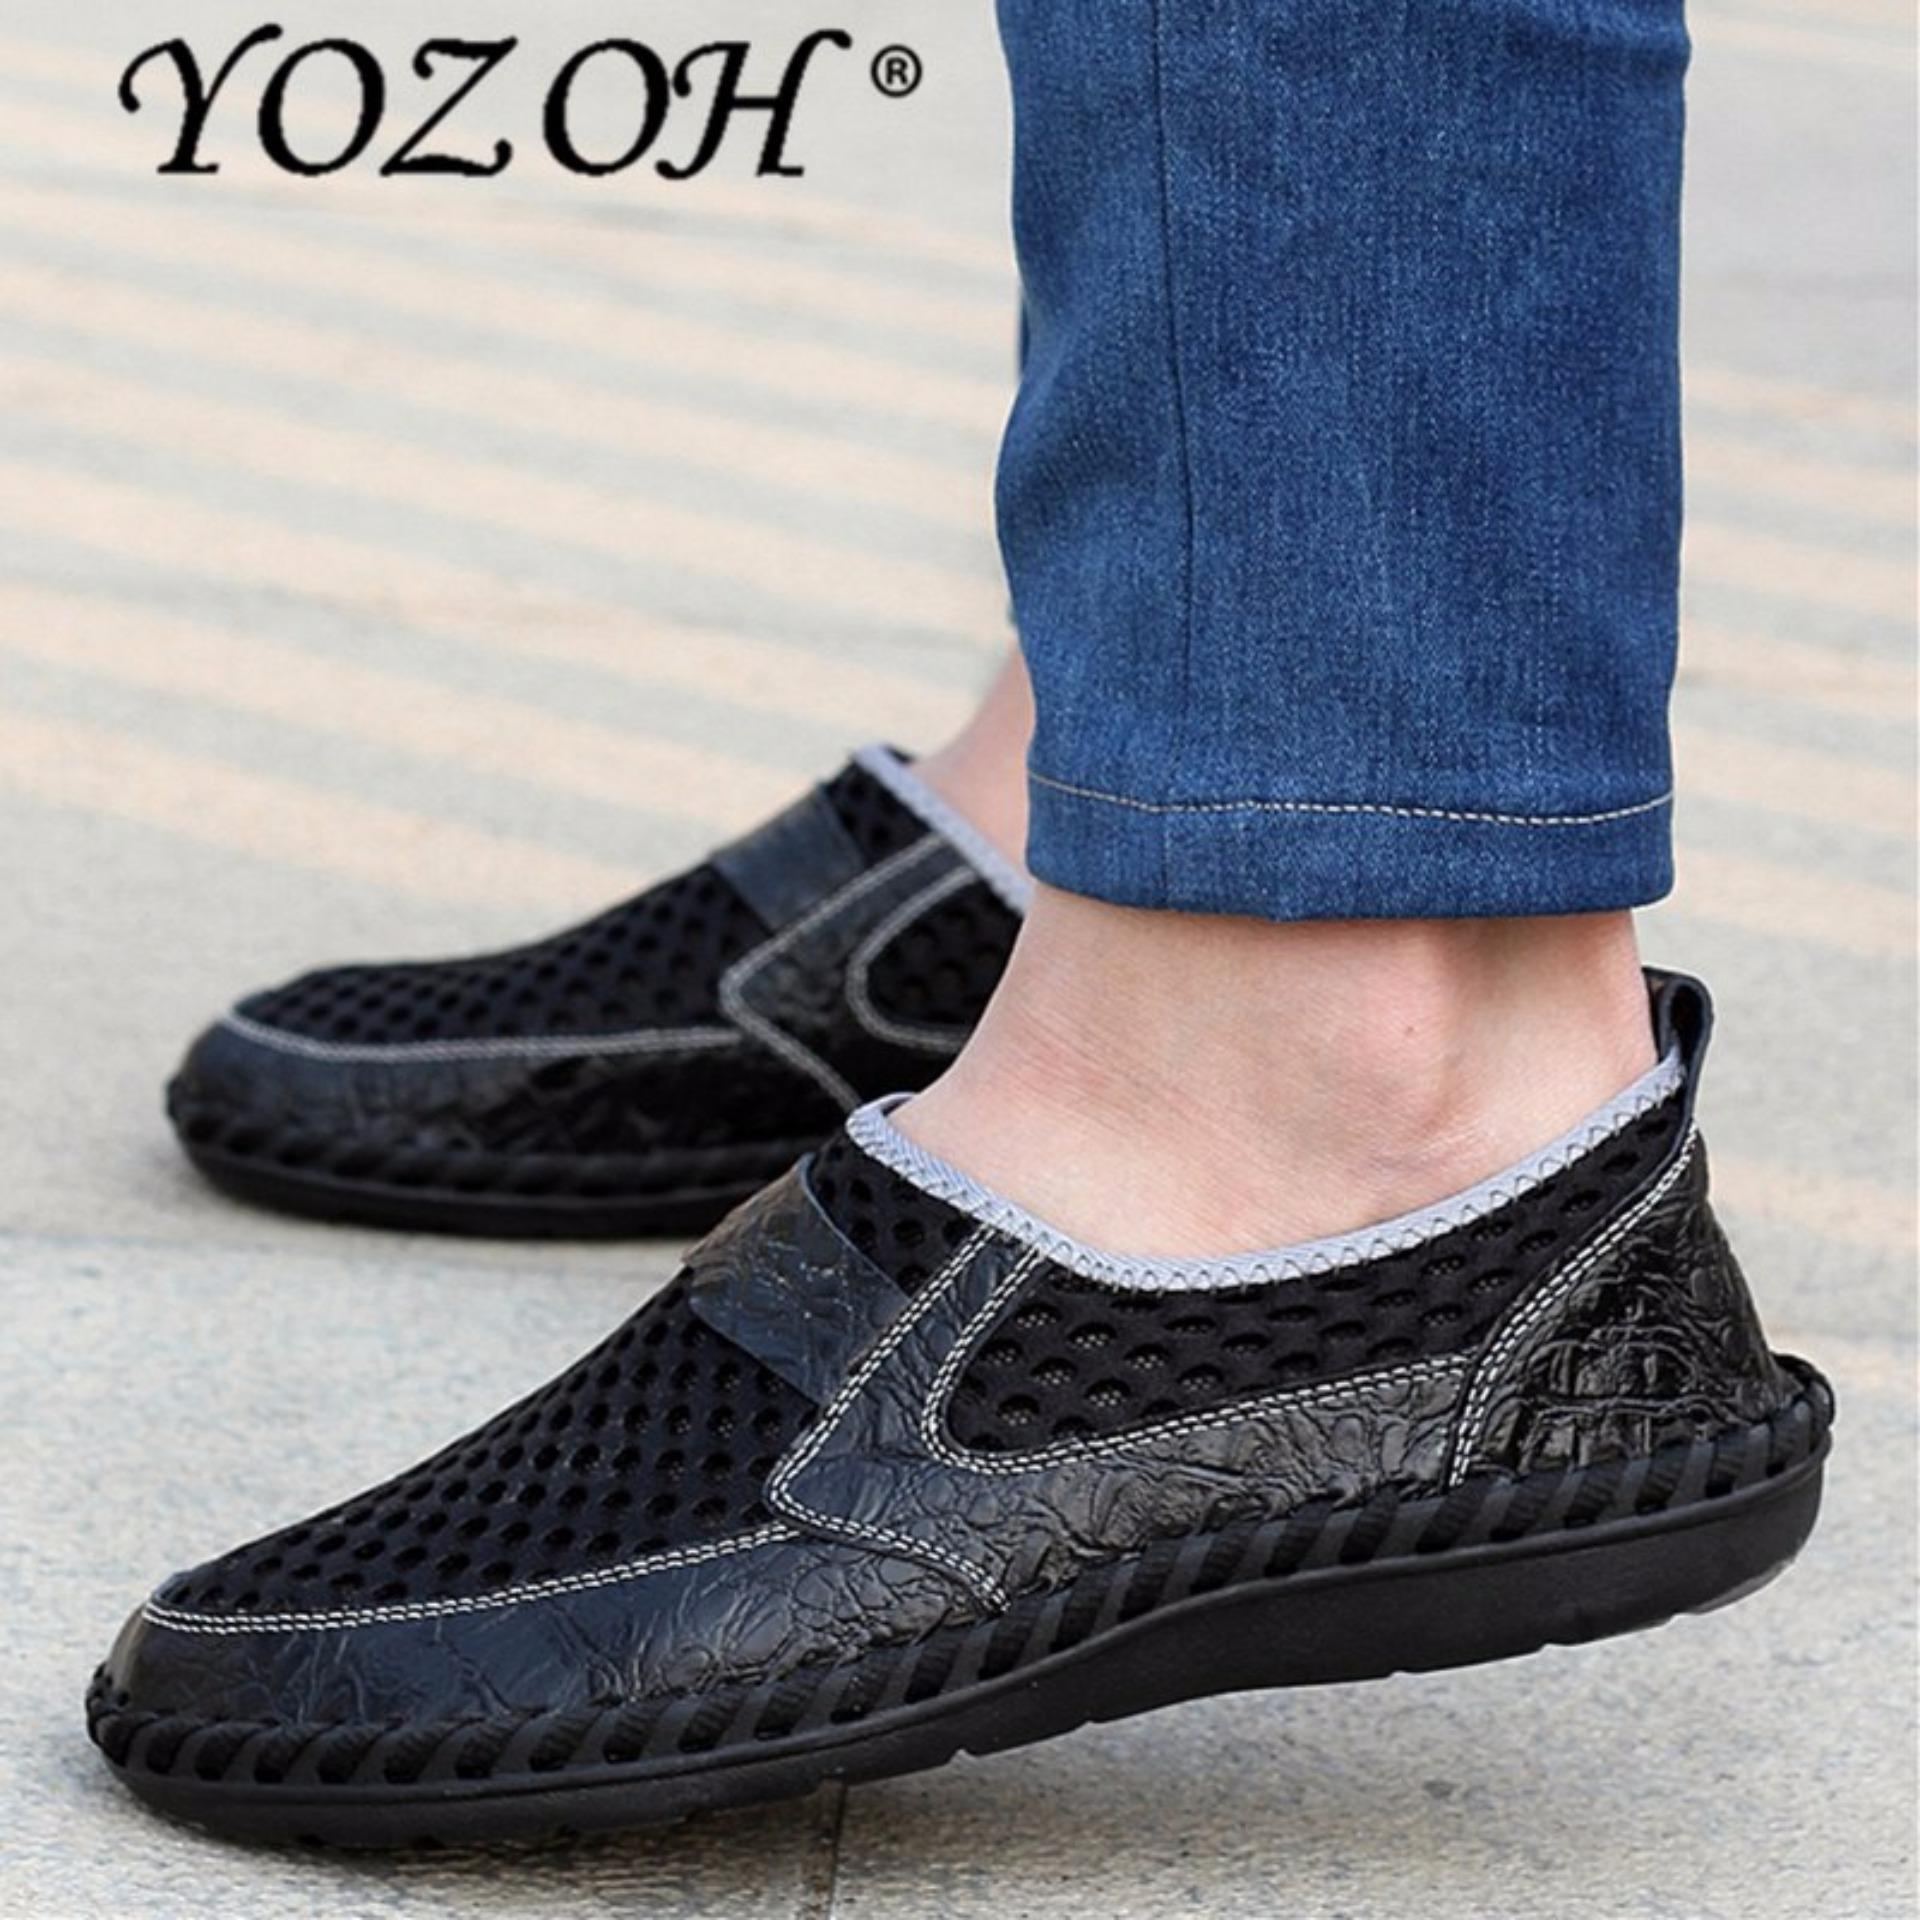 Beli Yozoh Musim Panas Bernapas Mesh Sepatu Sepatu Kasual Pria Kulit Asli Slip On Brand Fashion Sepatu Musim Panas Pria Lembut Nyaman Hitam Baru